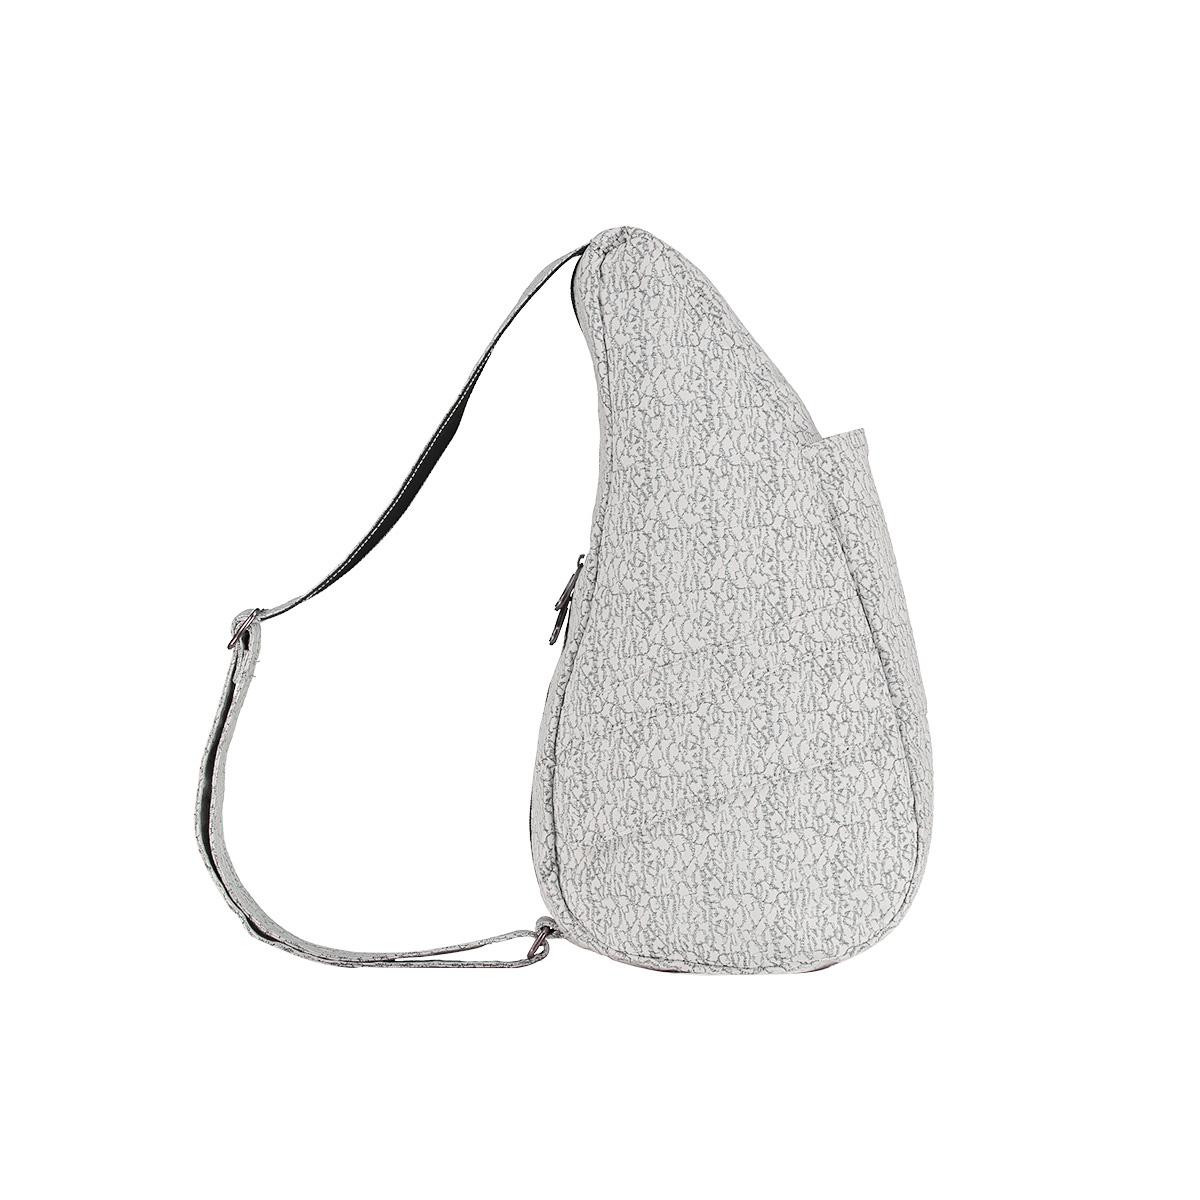 Healthy Back Bag/ヘルシーバックバッグ/ショルダーバッグ/ボディバッグ/旅行バッグ/軽量/レディース/メンズ 《限定ポーチ付》 公式ストア ヘルシーバックバッグ クラックル Sサイズ ブラック/ホワイト